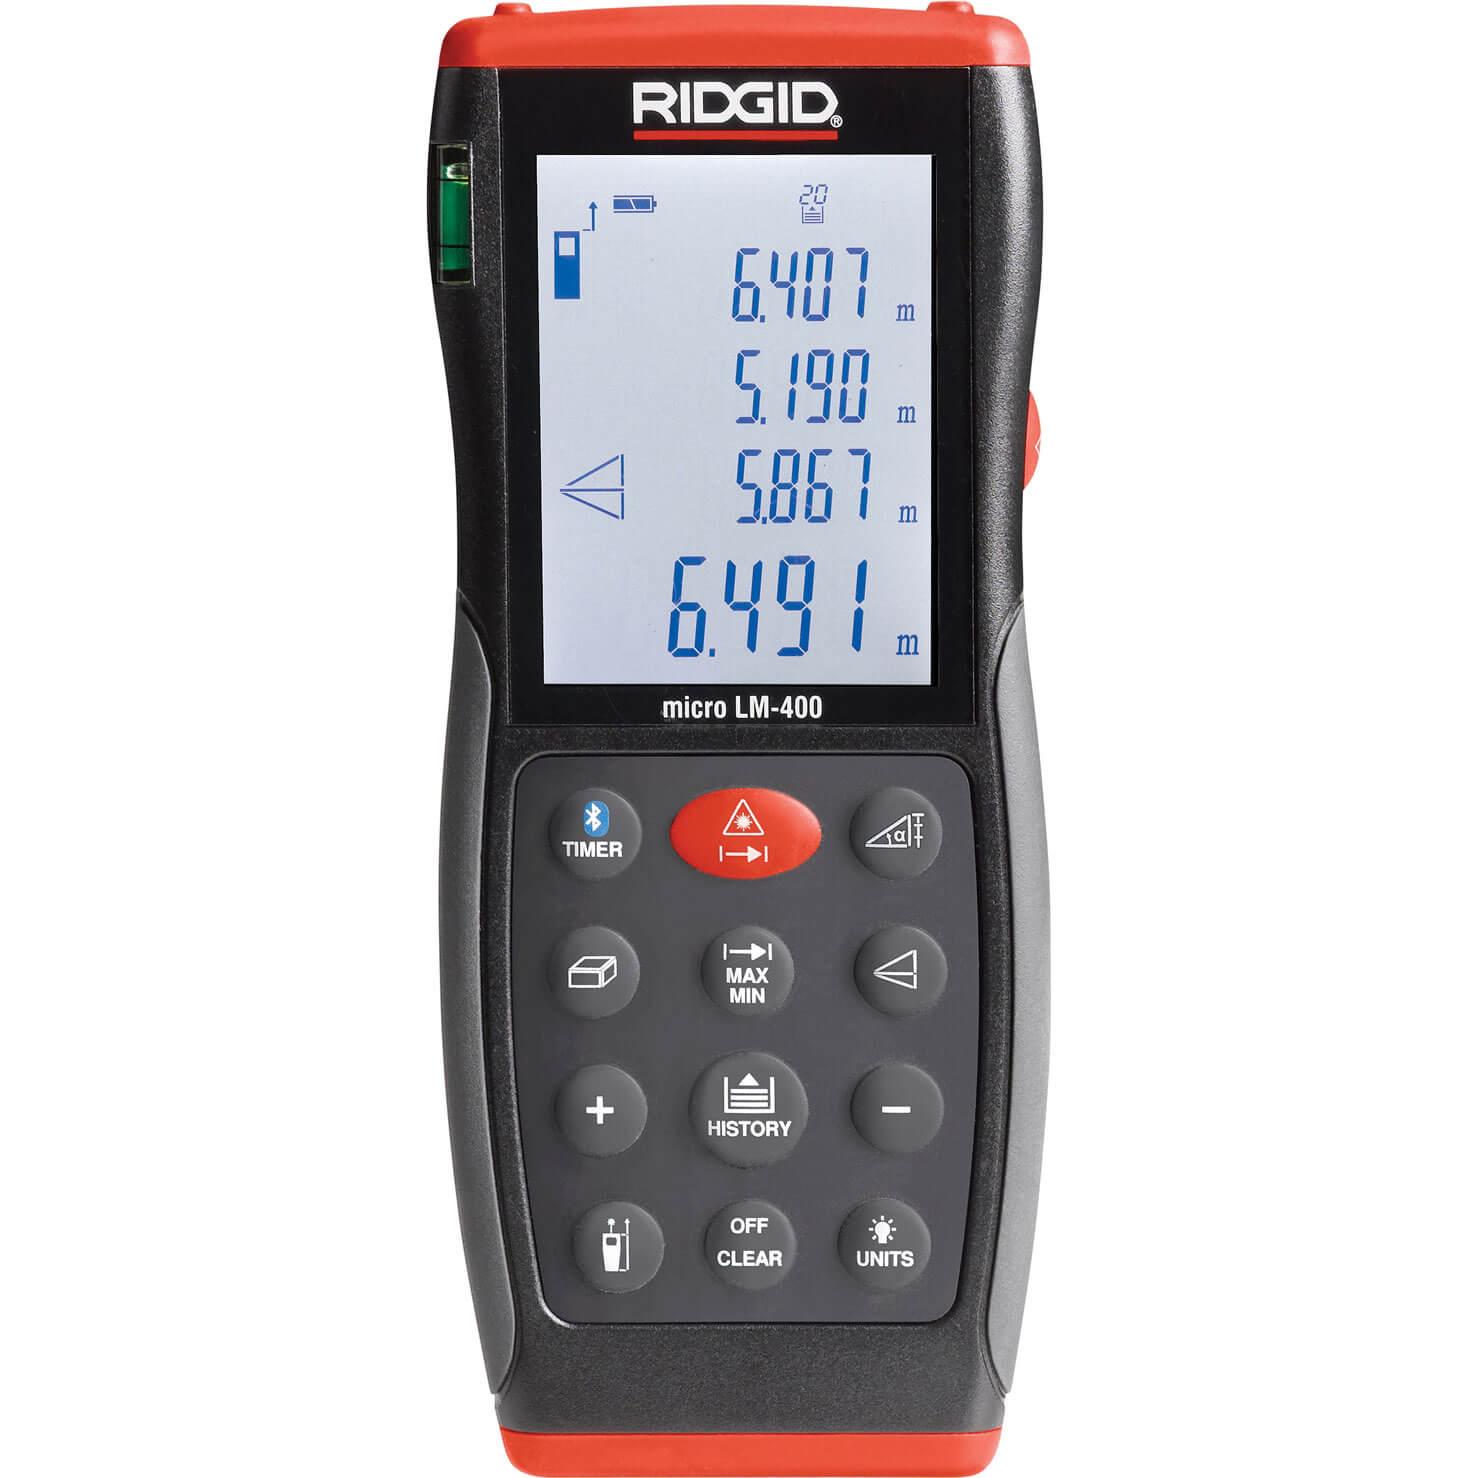 Ridgid Micro LM400 Advanced Distance Laser Measure 70m Range 70m / 229ft